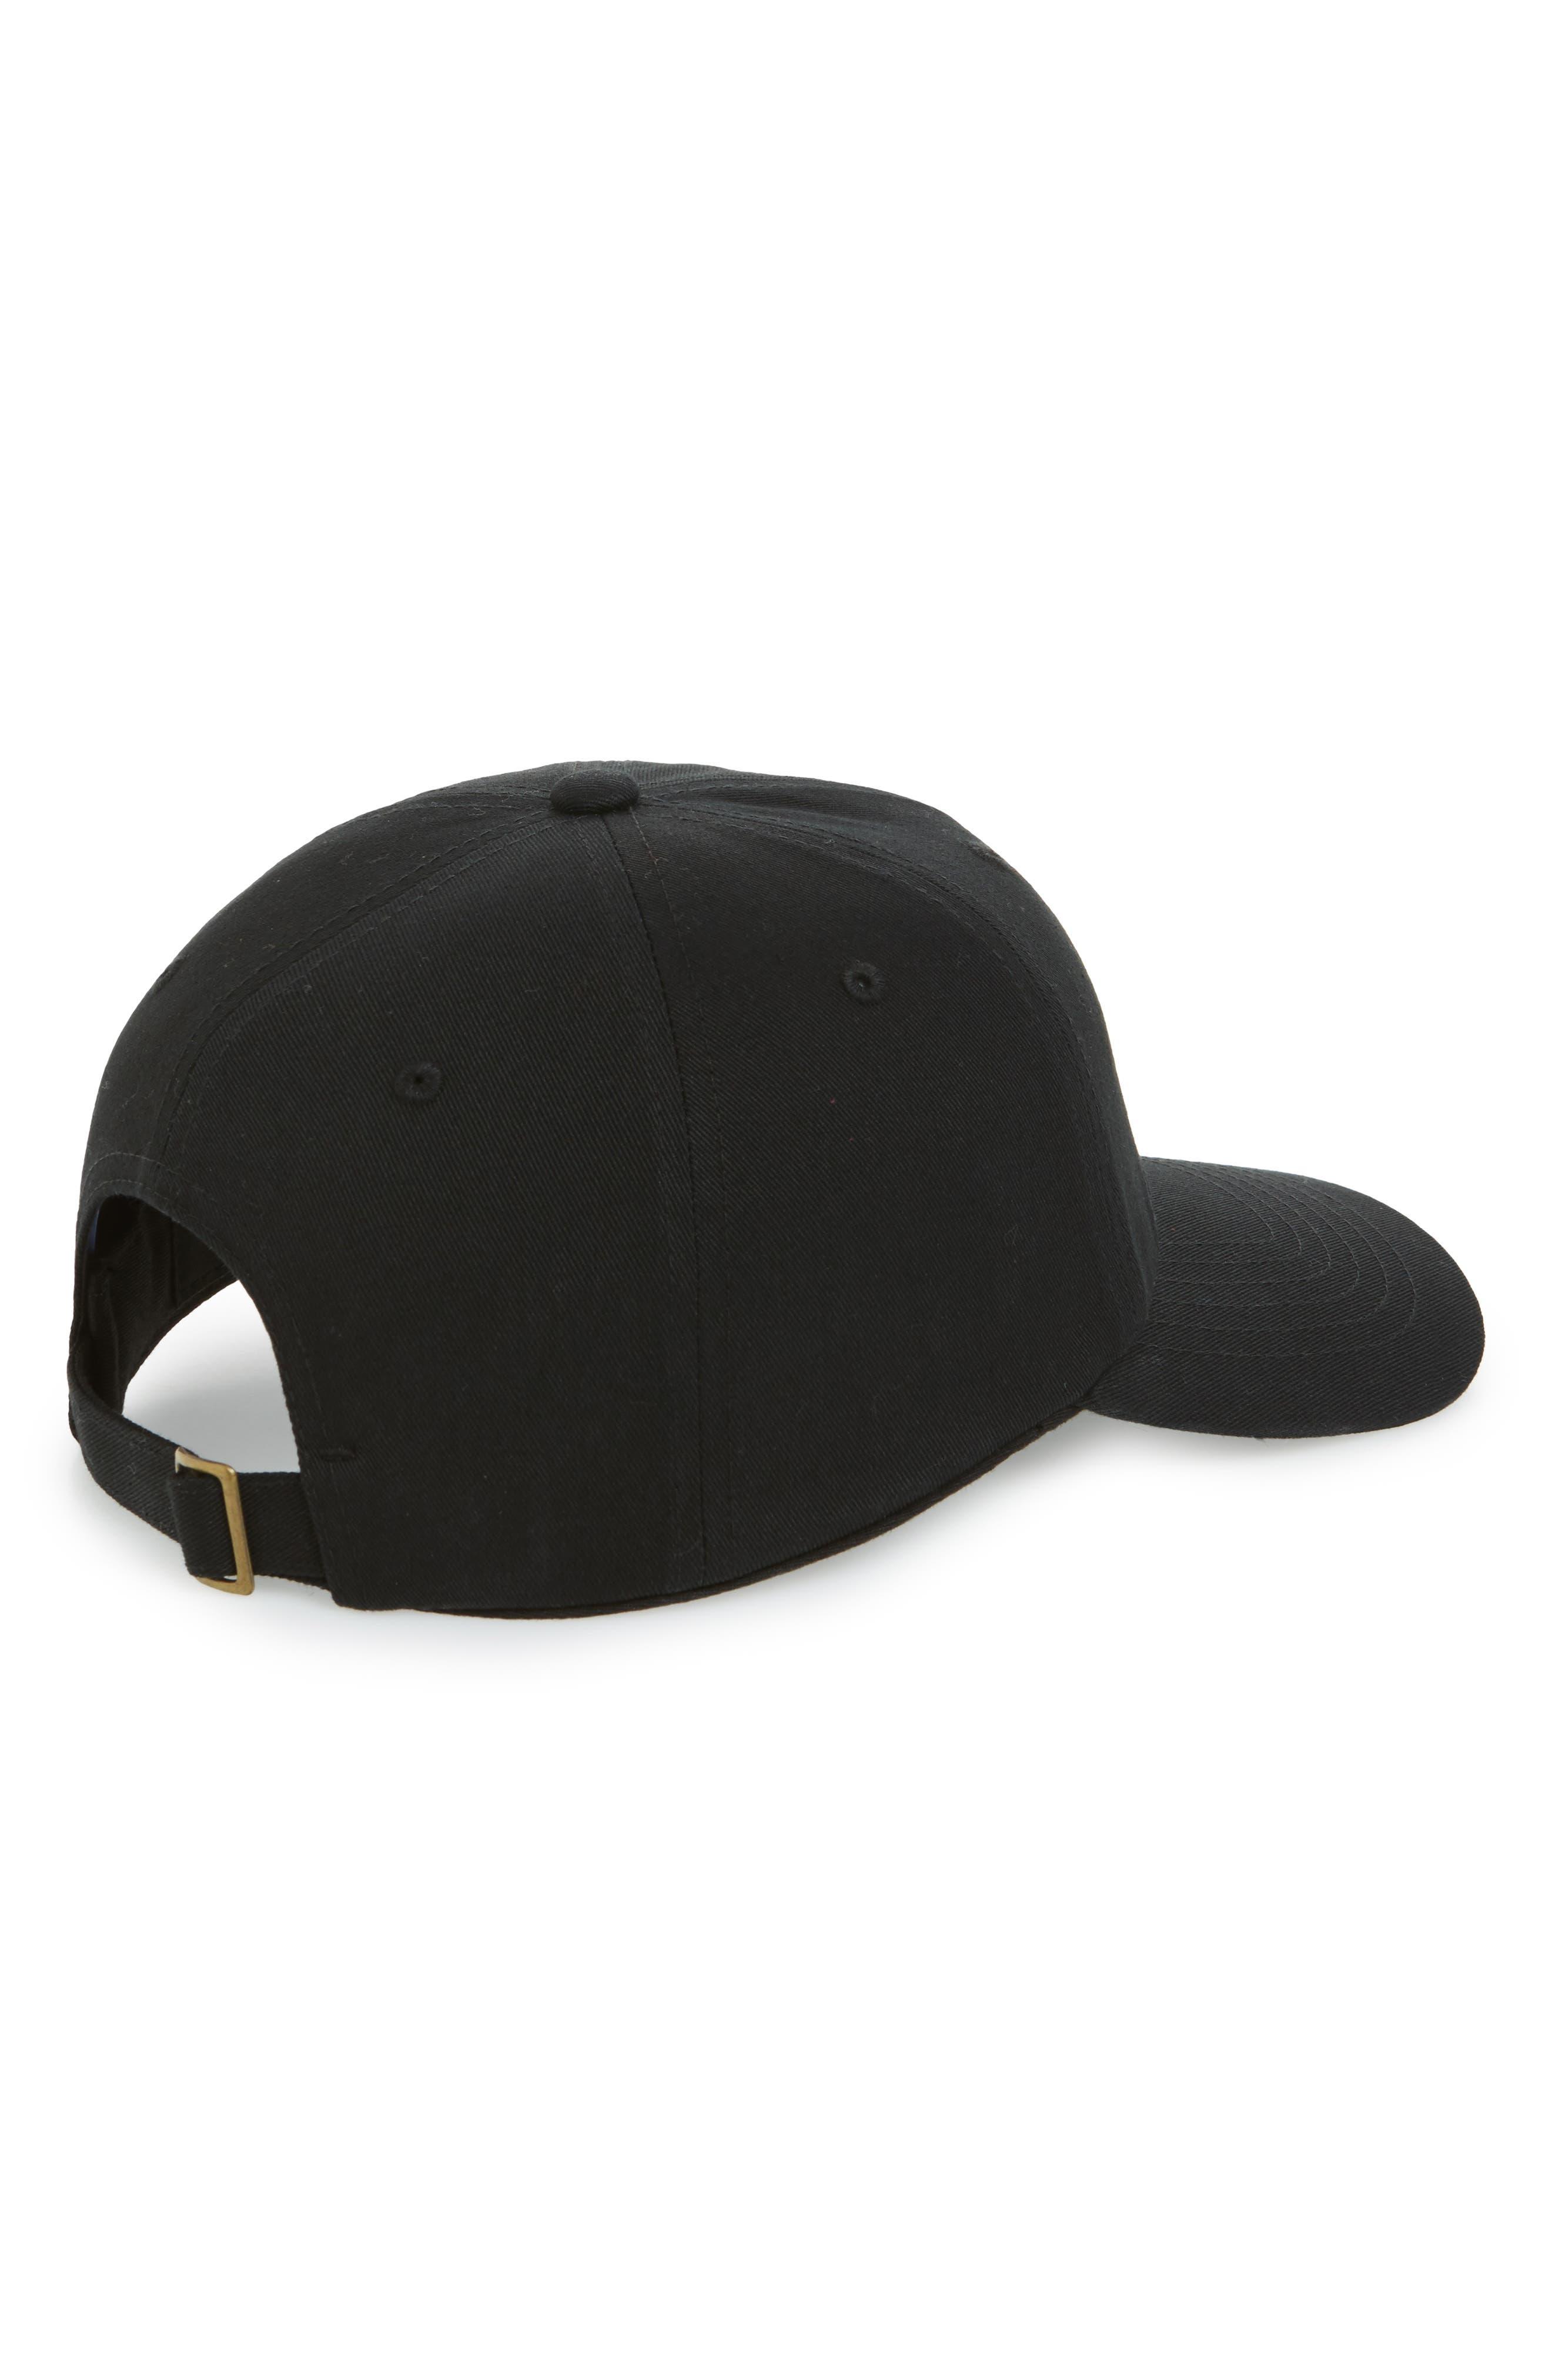 Stith Baseball Cap,                             Alternate thumbnail 3, color,